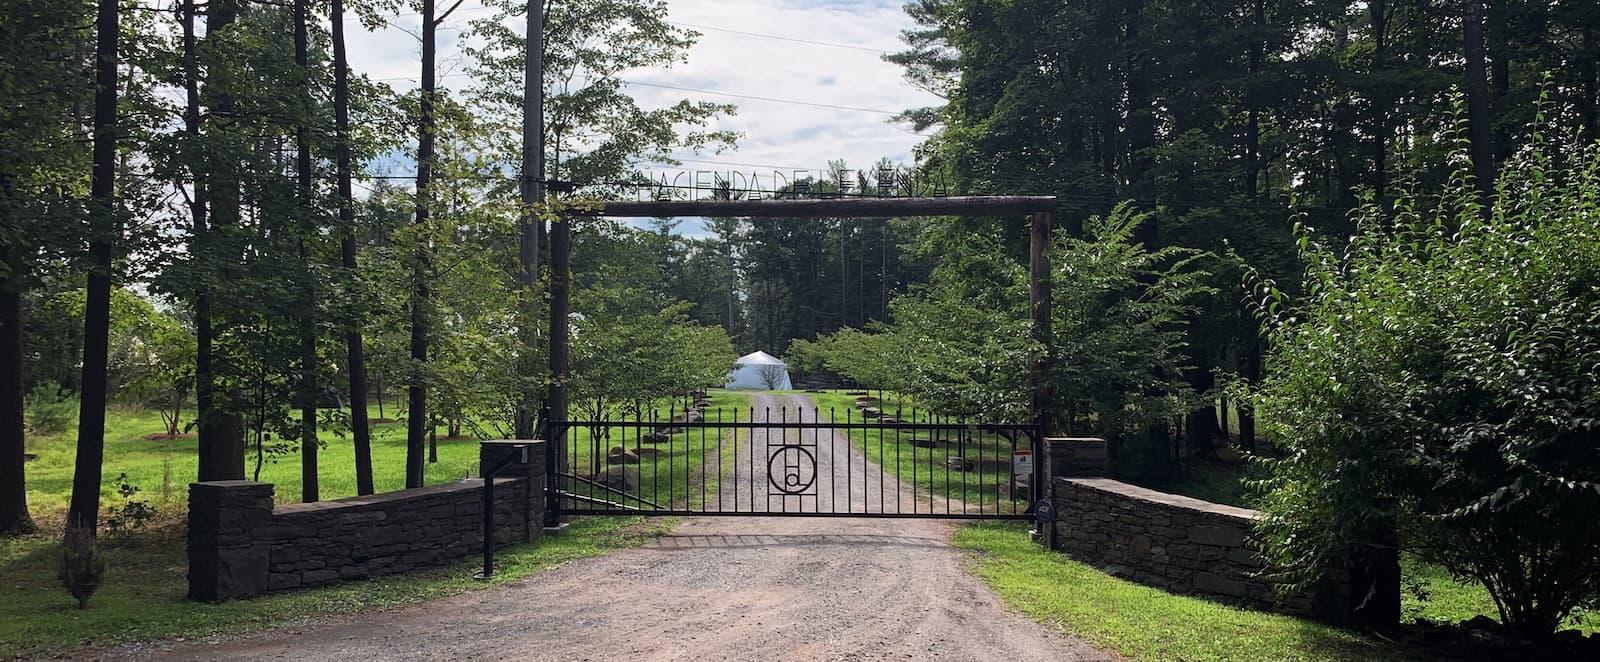 hdl-gate